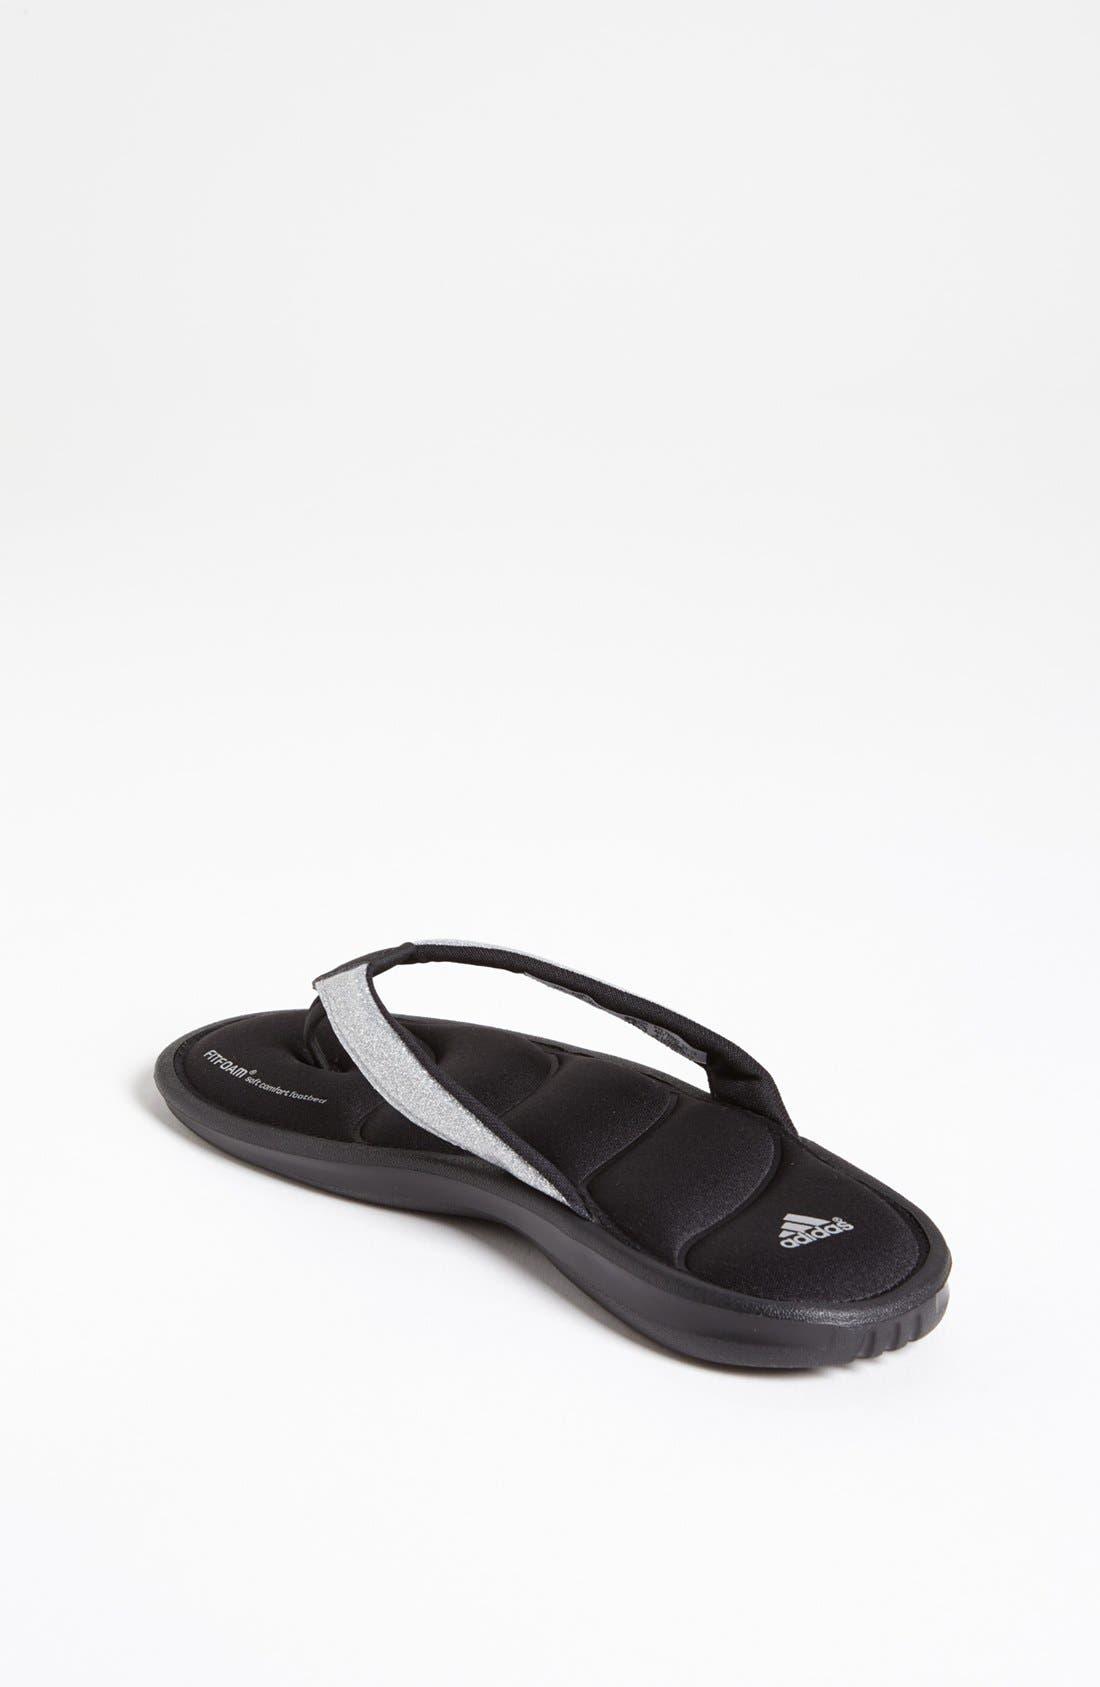 Alternate Image 2  - adidas 'Chillwyanda' Sandal (Toddler, Little Kid & Big Kid)